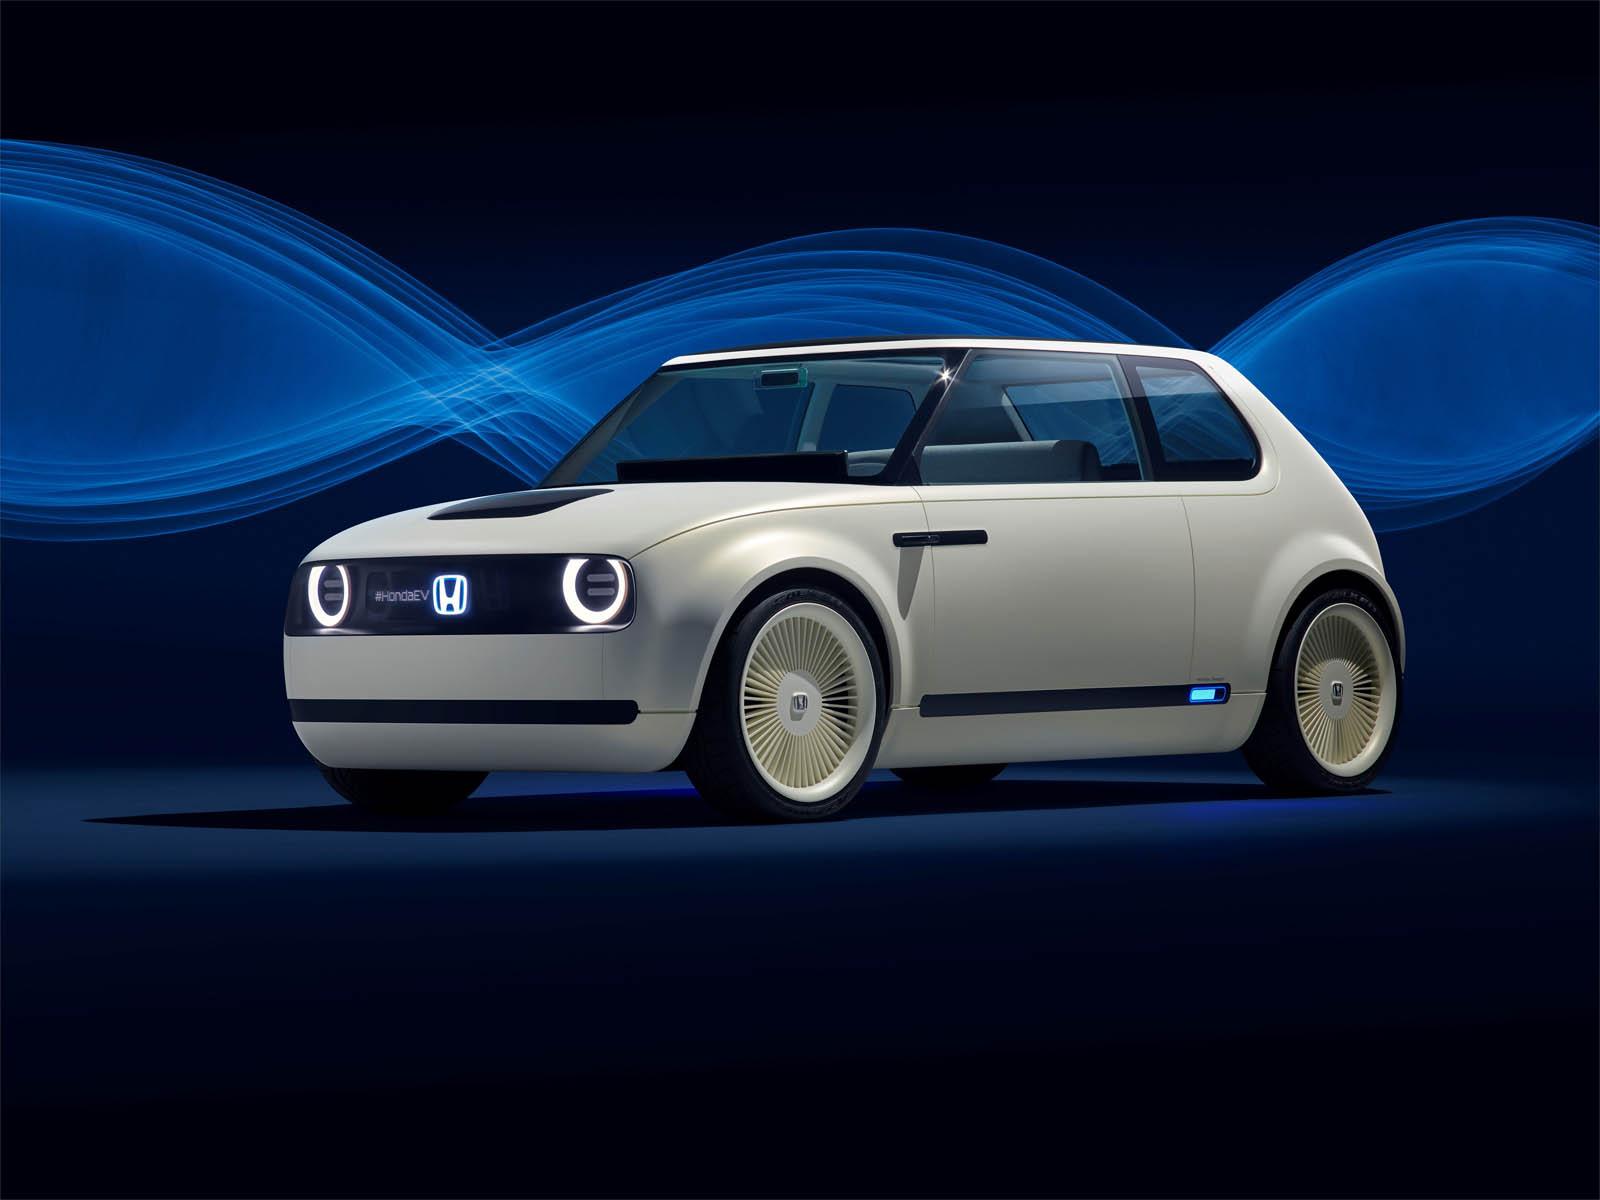 113866_Honda_Urban_EV_Concept_unveiled_at_the_Frankfurt_Motor_Show%2Bcopy.jpg